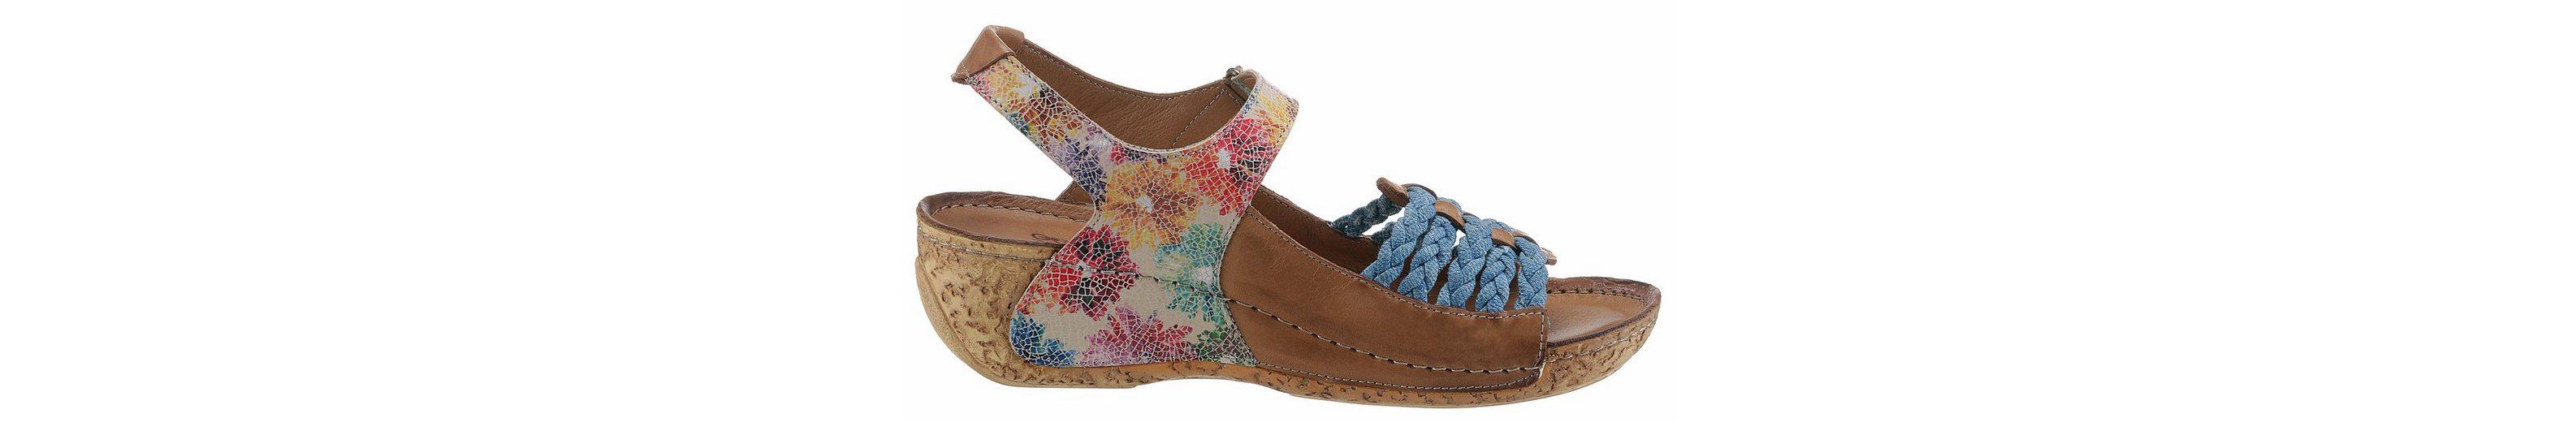 Gemini Sandalette, mit Blumendruck